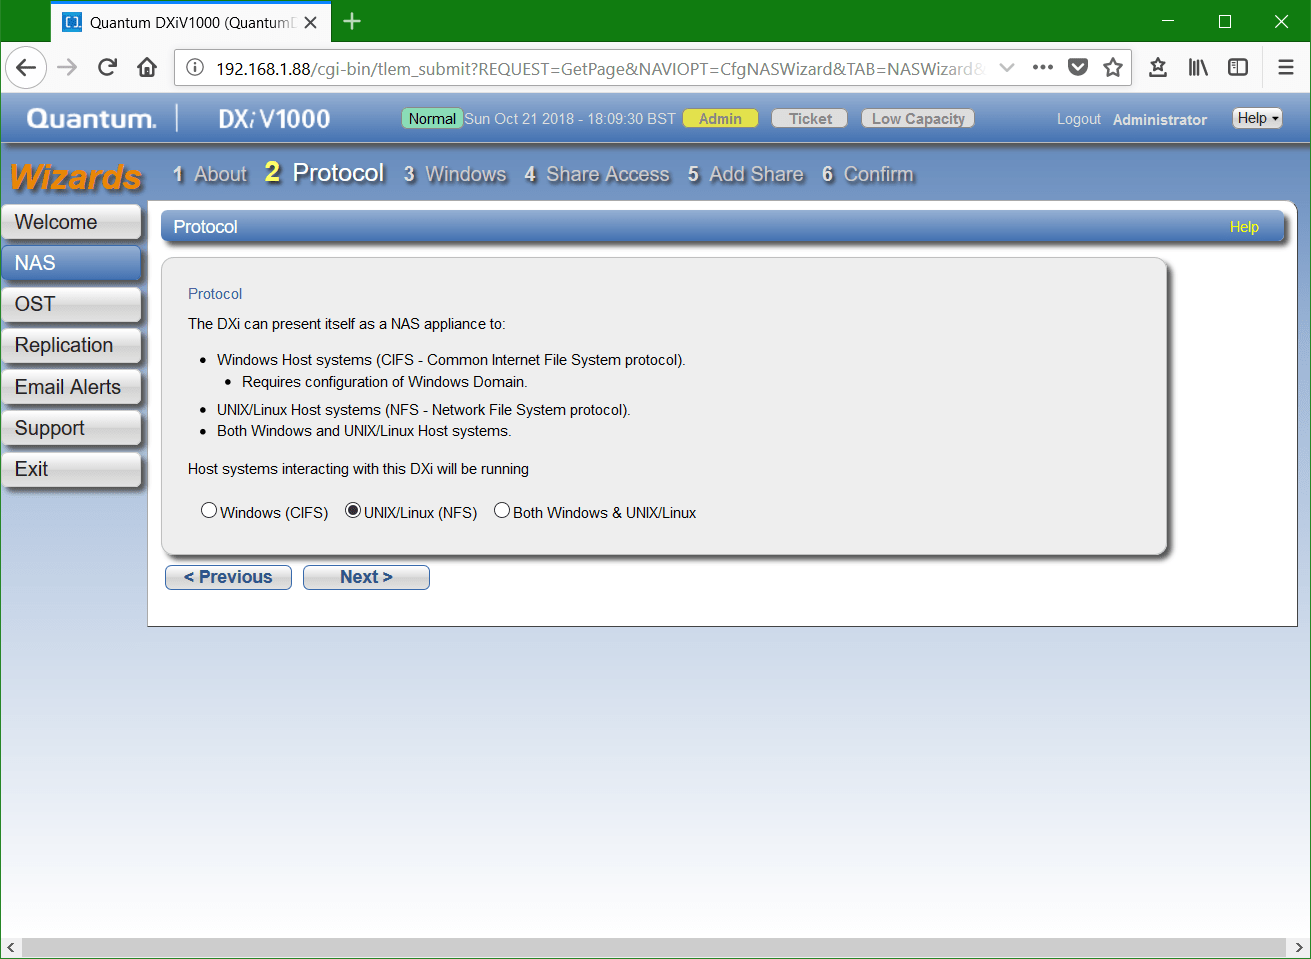 domalab.com Quantum DXi NFS protocol